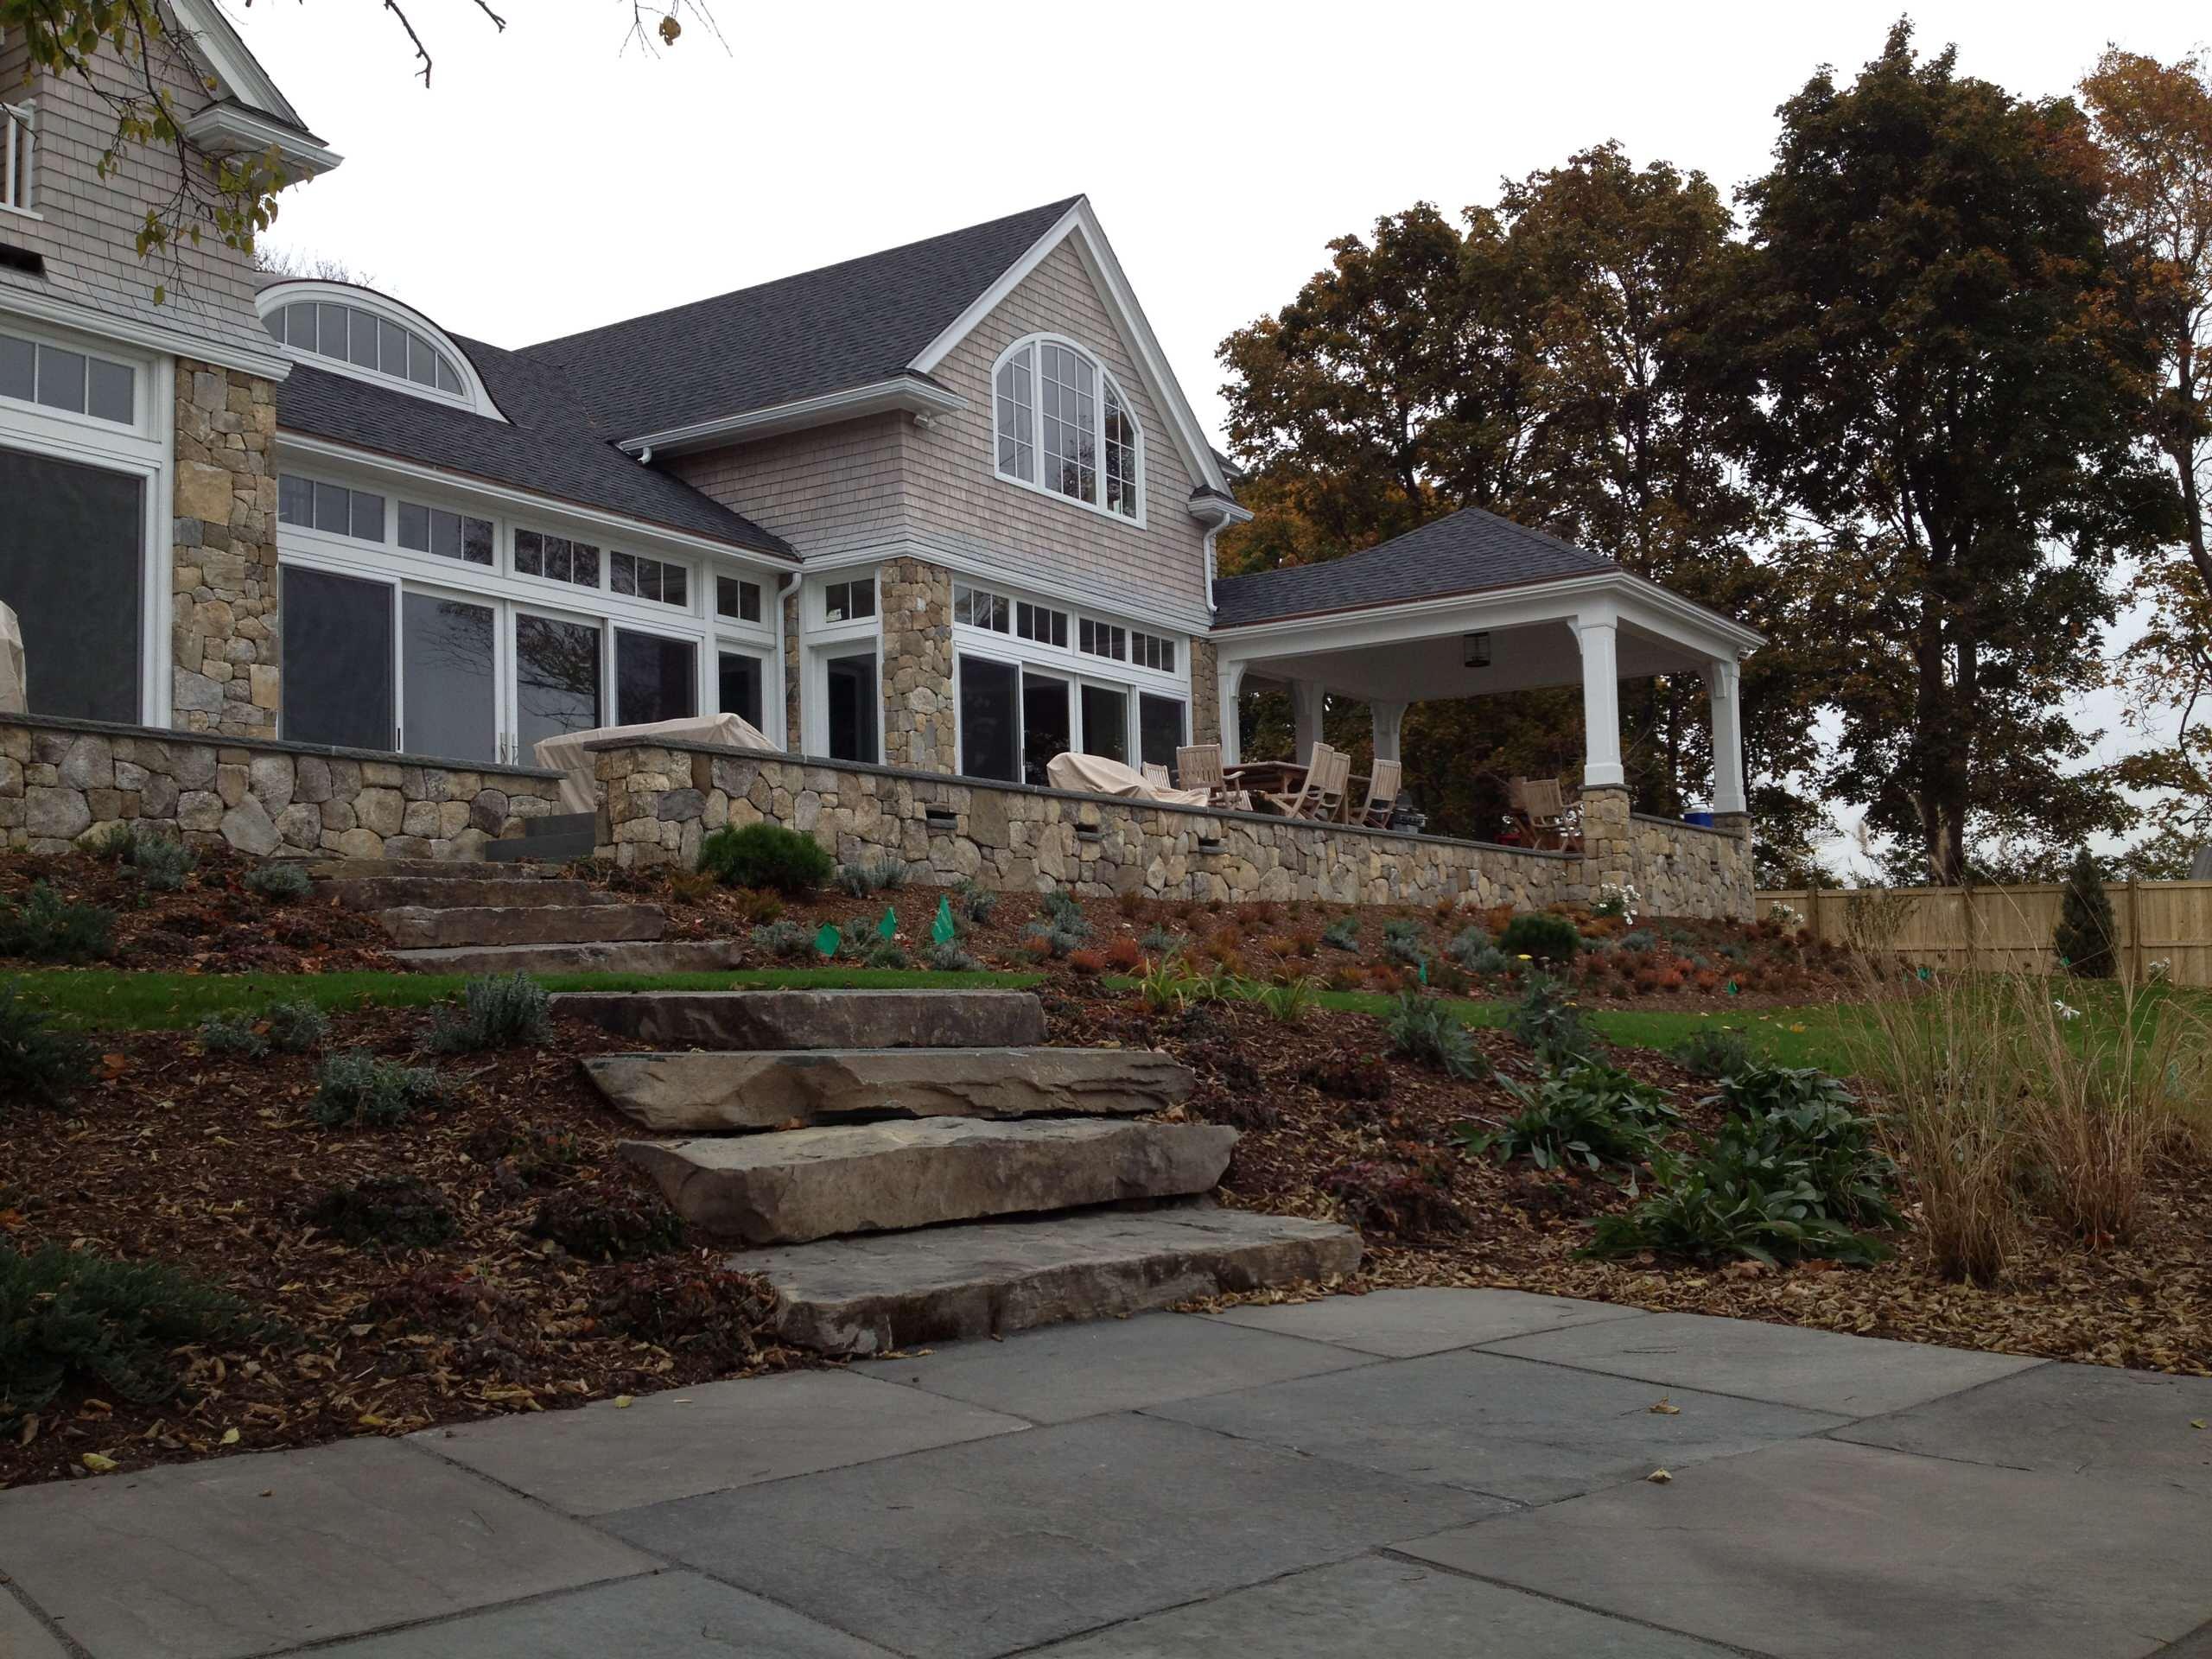 We added a small, shaded bluestone terrace adjacent to seawall.